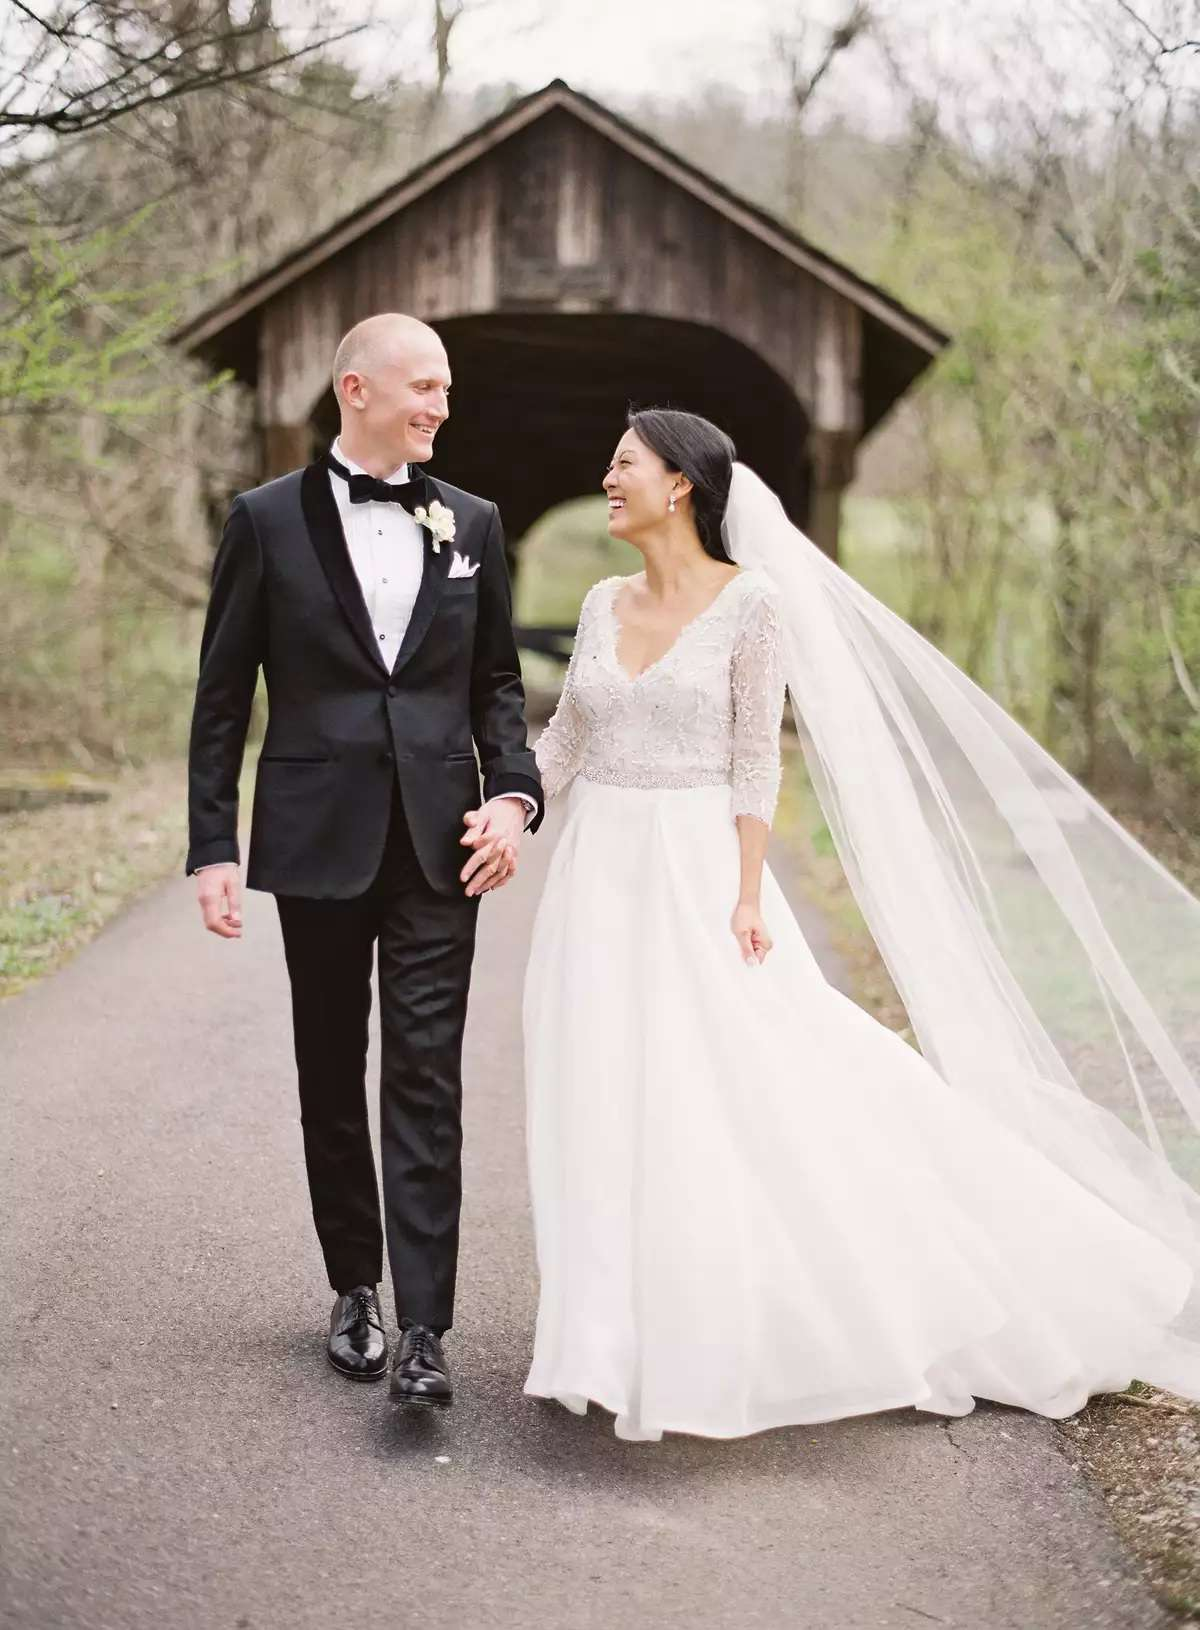 Walland, Tennessee wedding